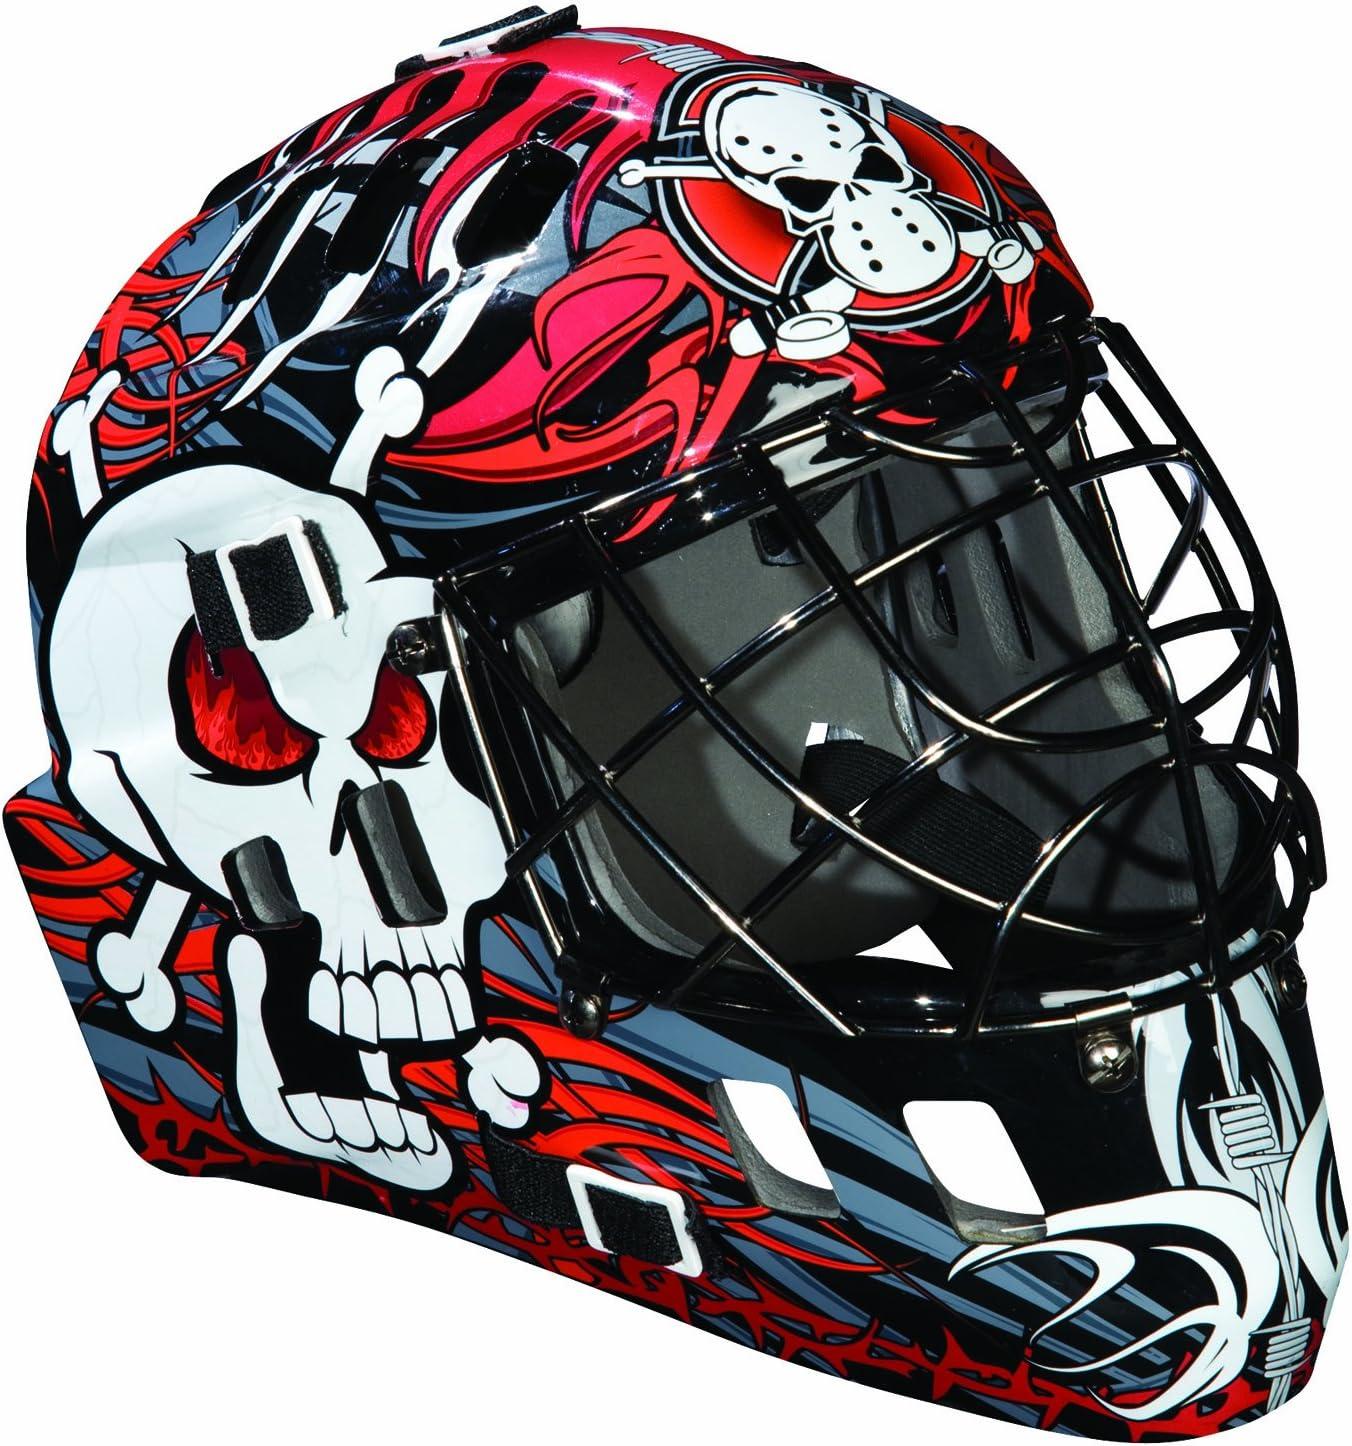 Franklin Sports NHL Rage Street Hockey SX Pro GFM 1000 Goalie Face Mask : Hockey Masks And Shields : Sports & Outdoors